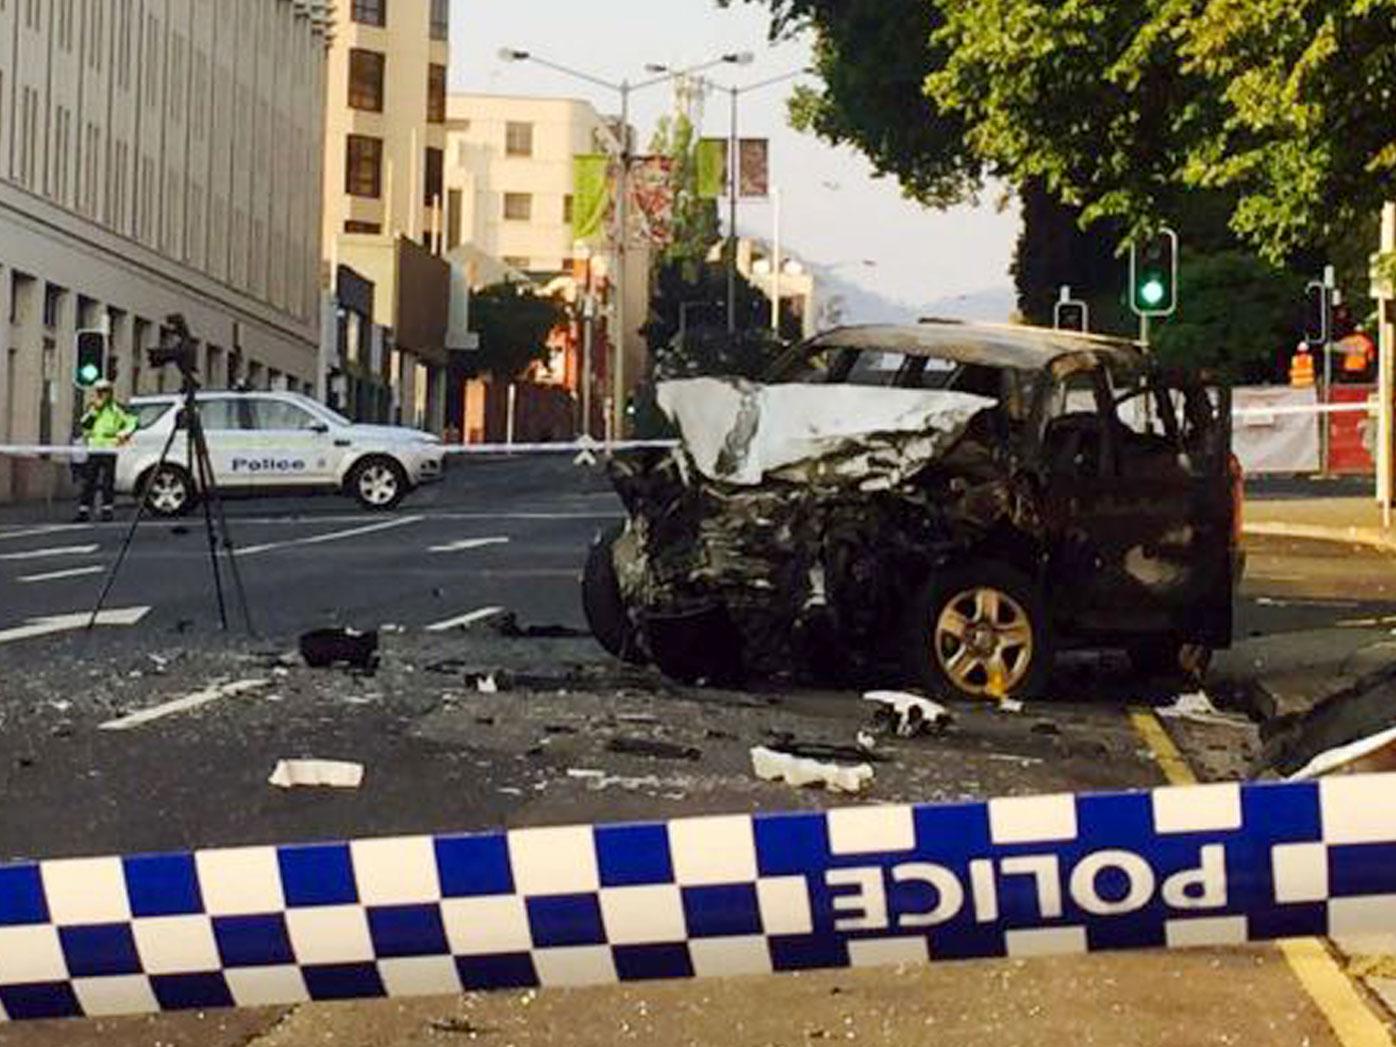 The scene of the crash on Davey Street, Hobart.